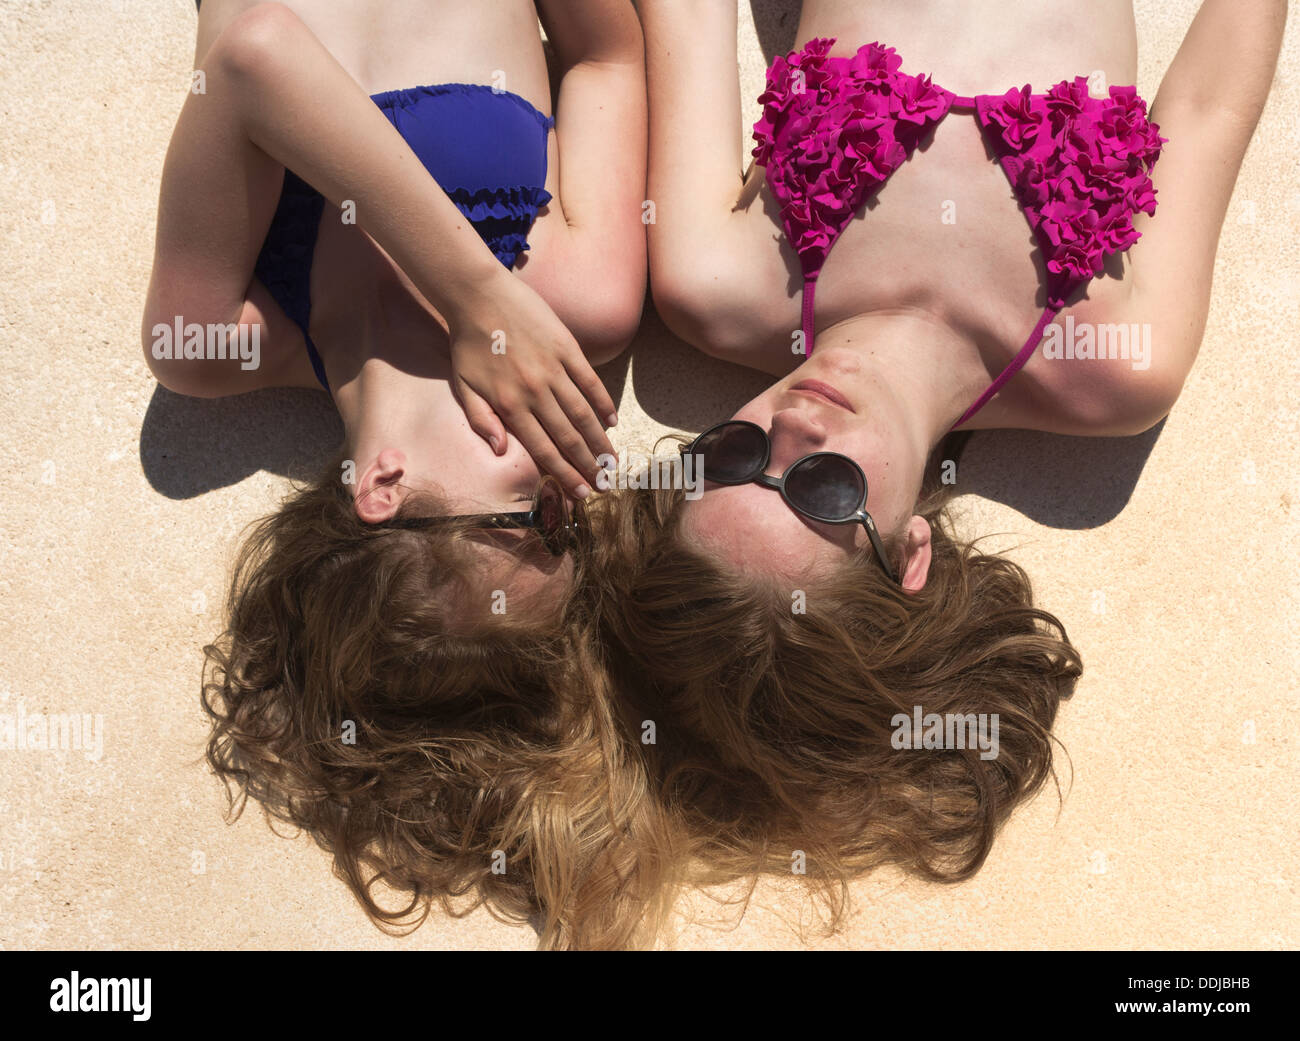 Two teenage girls whispering secrets. - Stock Image